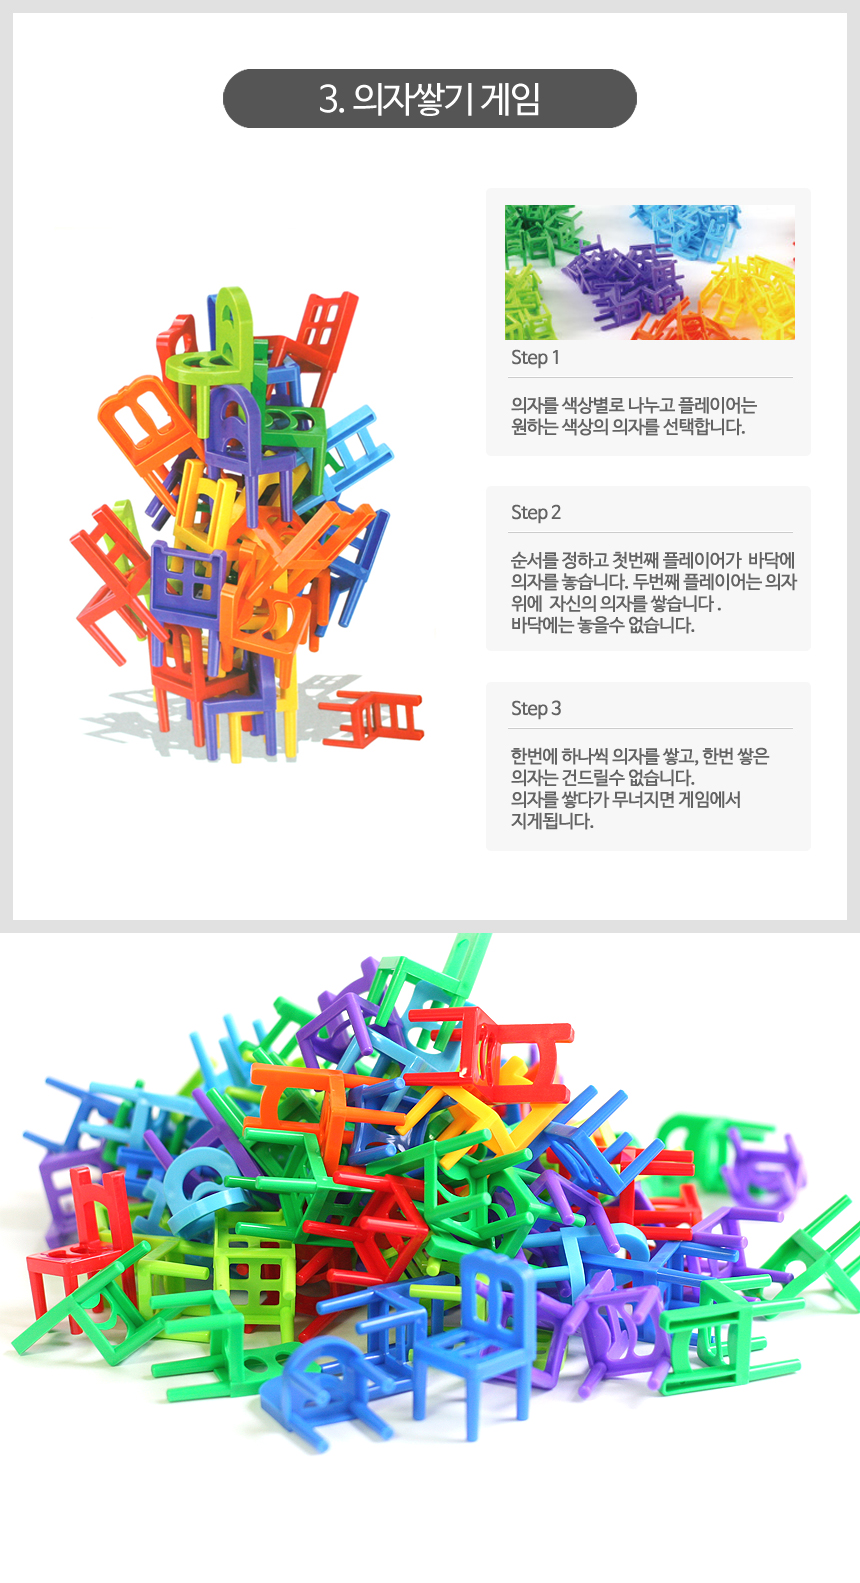 folding_chair2_04.jpg